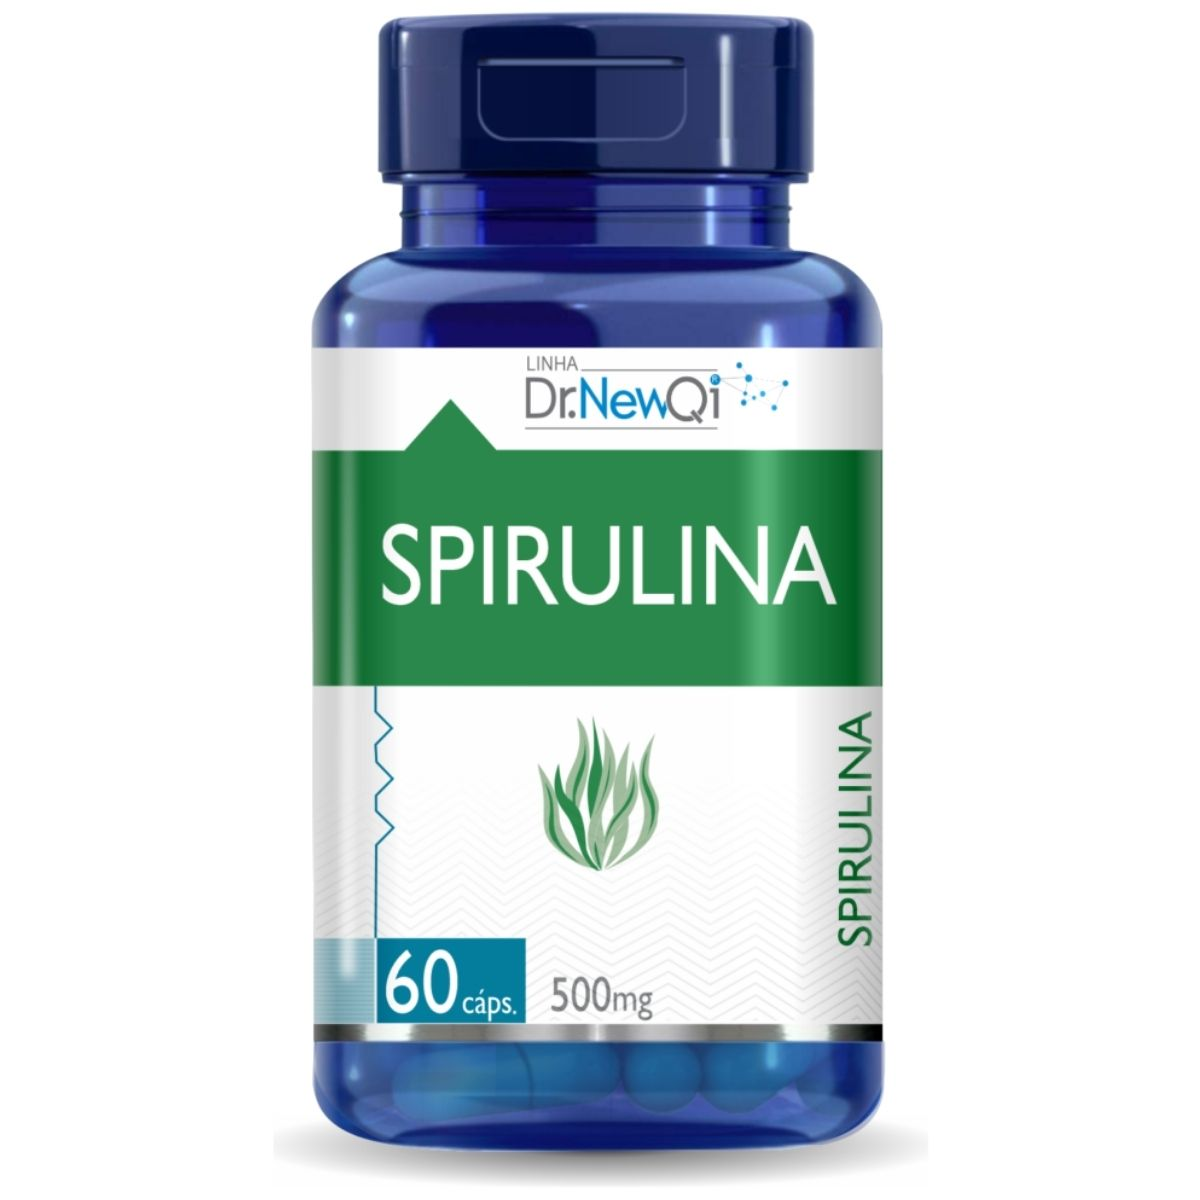 Spirulina Em Cápsulas 60 Cáps 500mg Dr. Lair/New QI - Upnutri